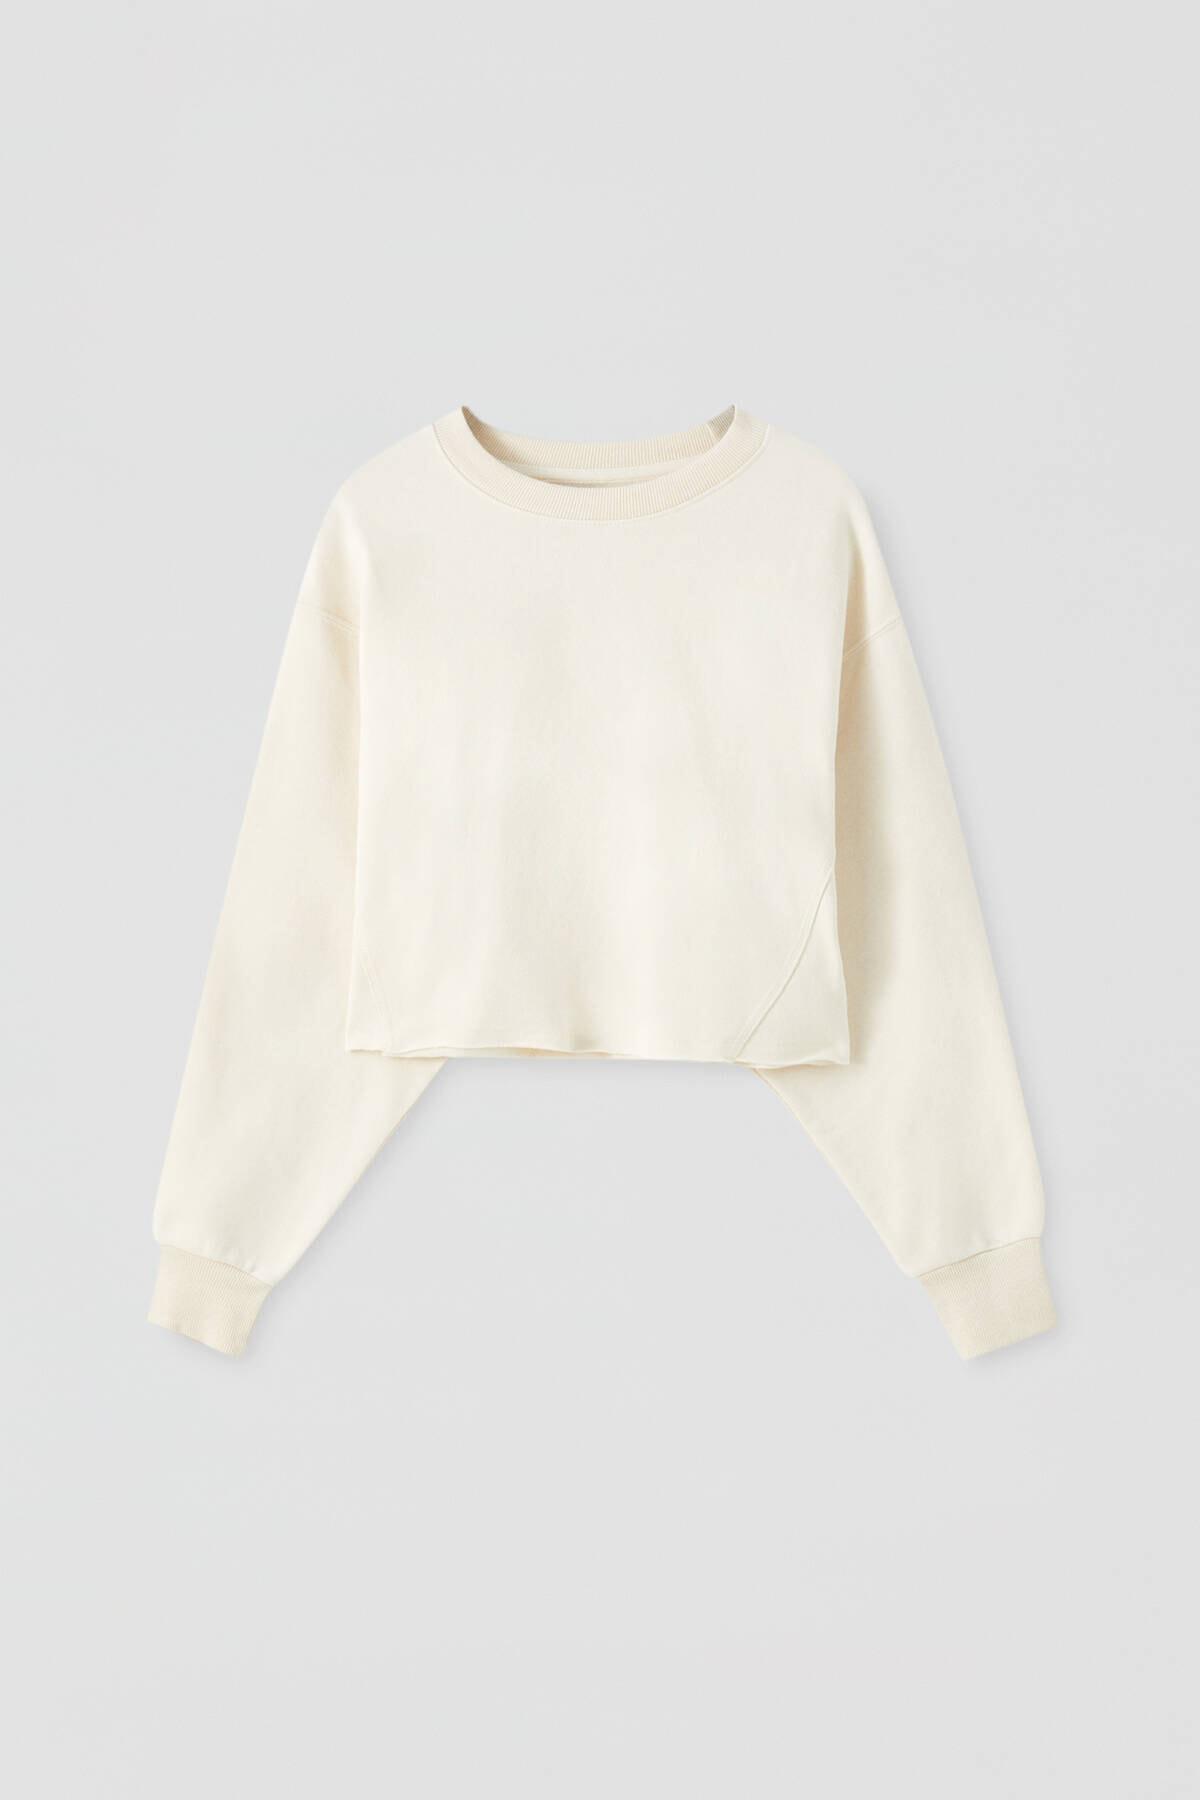 Pull & Bear Kadın Buz Rengi Rahat Crop Fit Sweatshirt 09594315 4